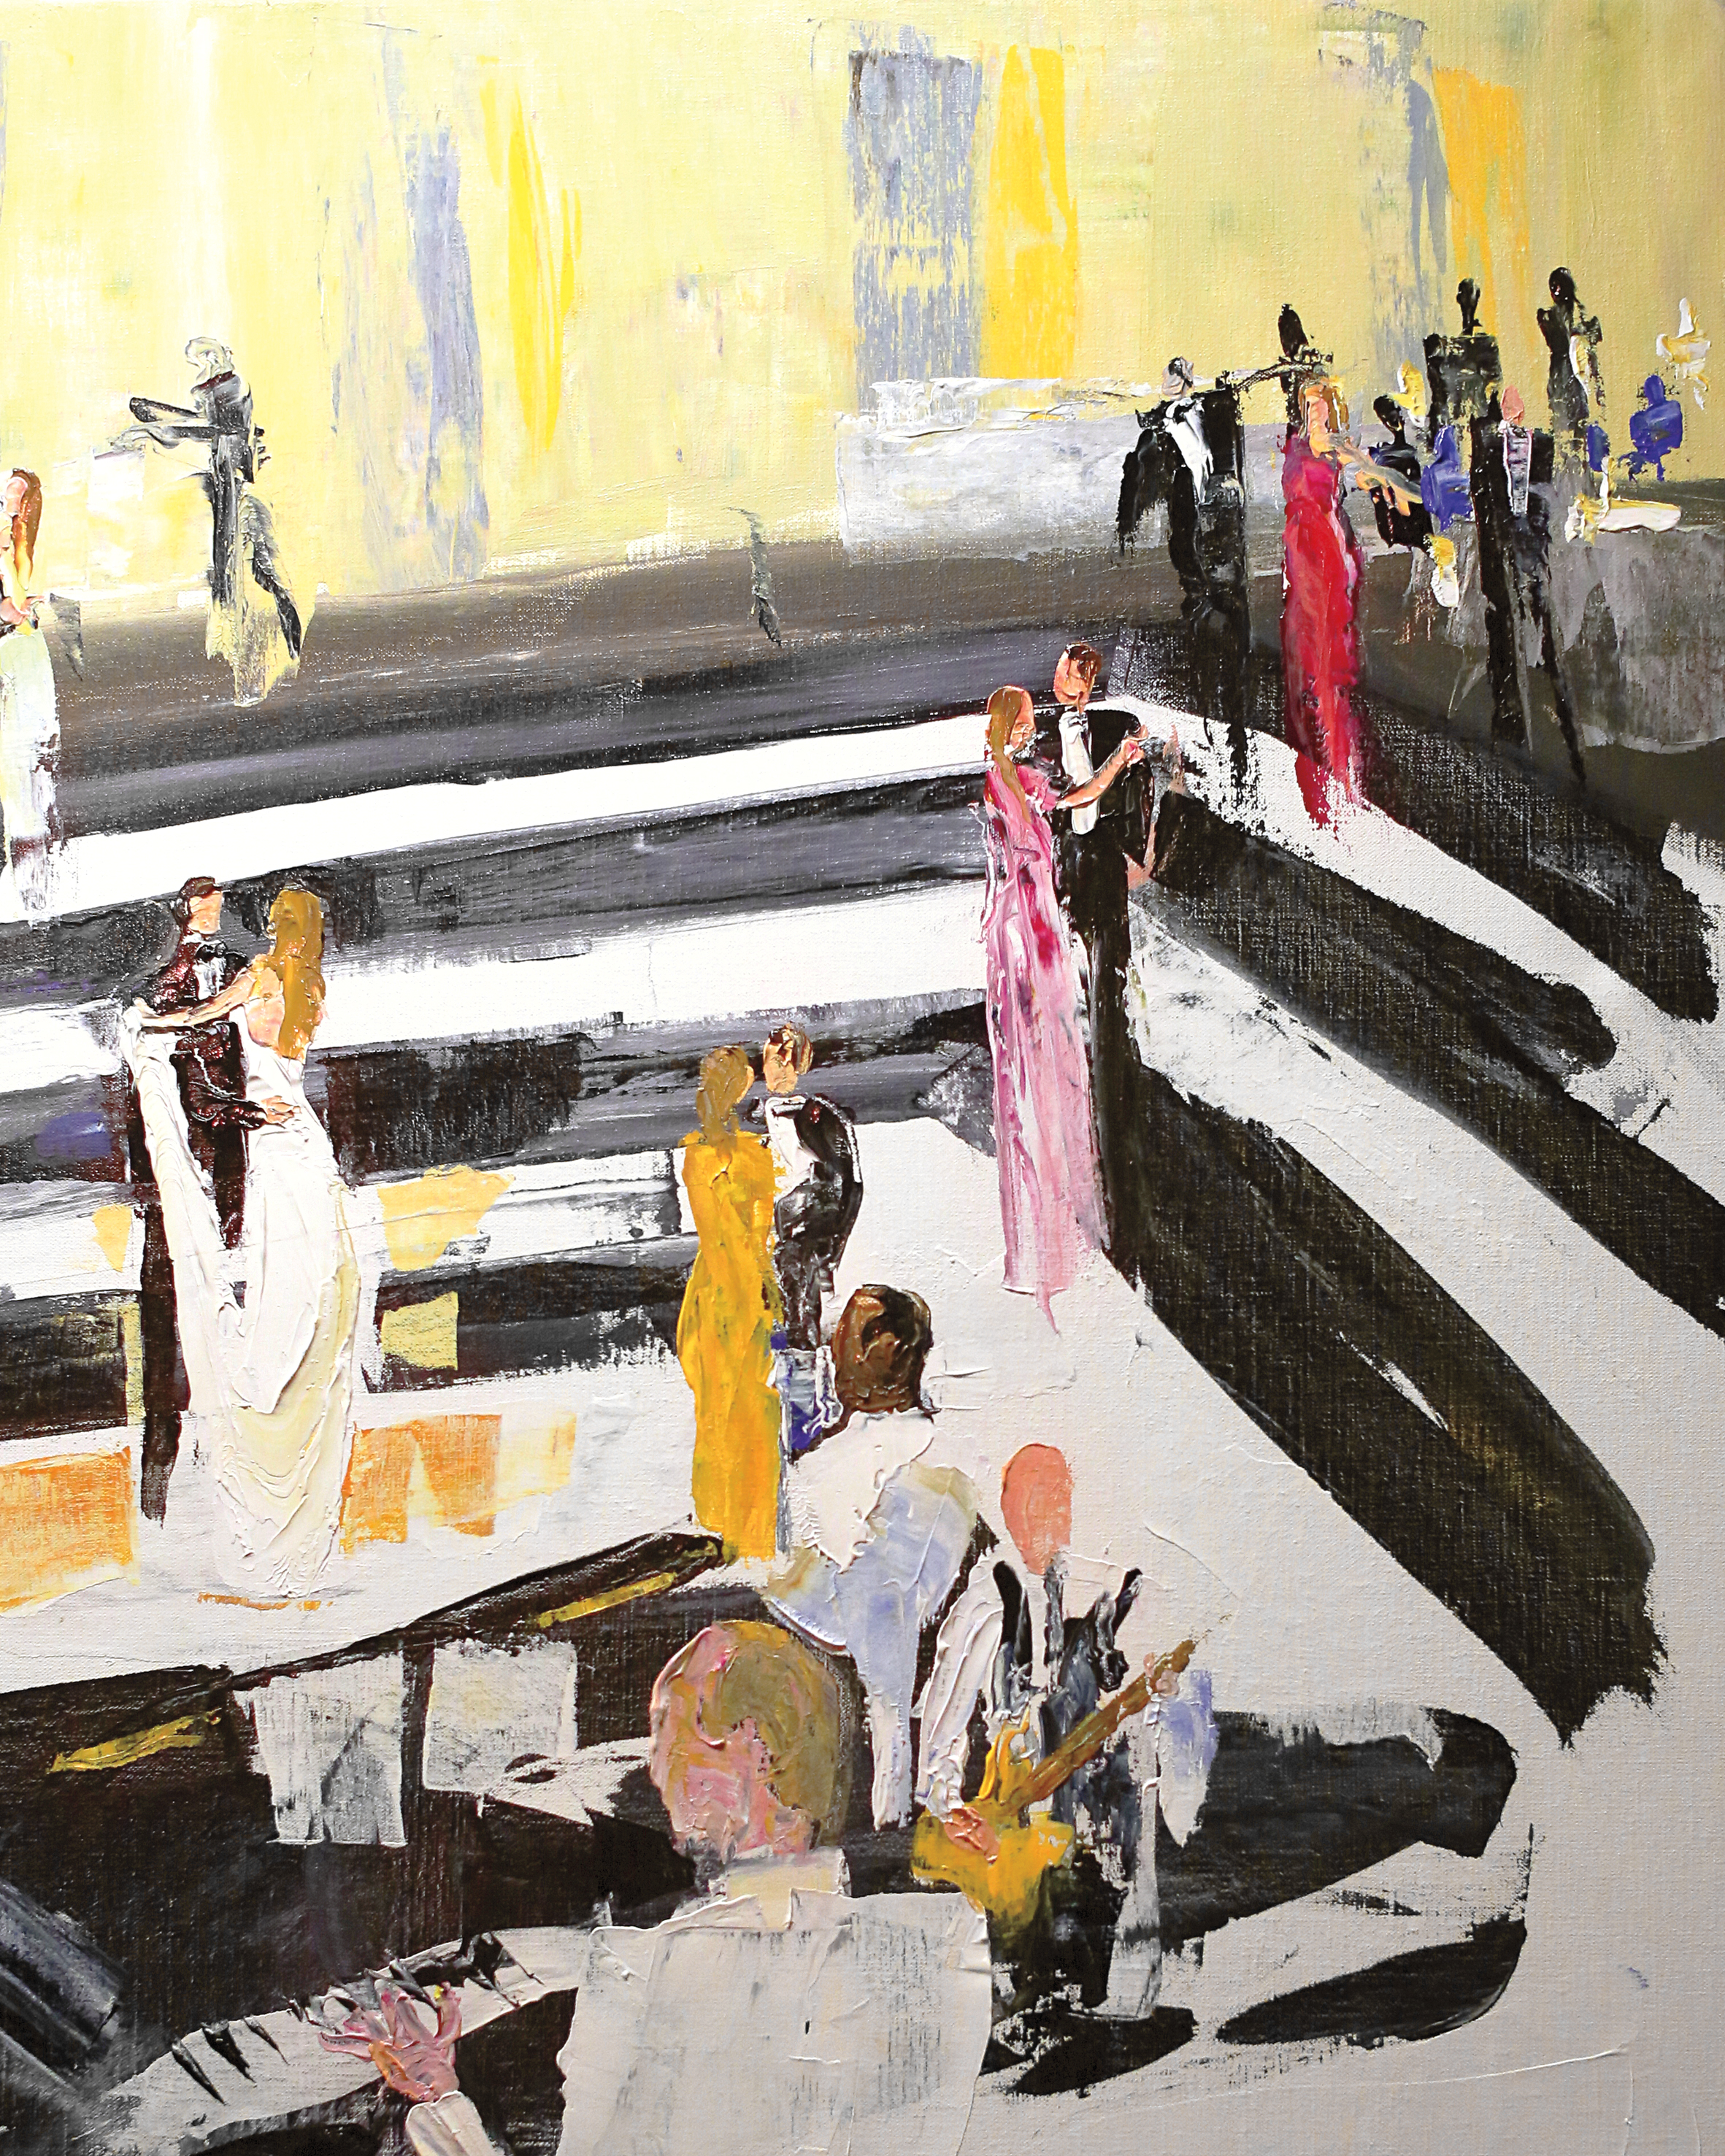 rw-jojo-eric-painting-449-elizabeth-messina-ds111226.jpg